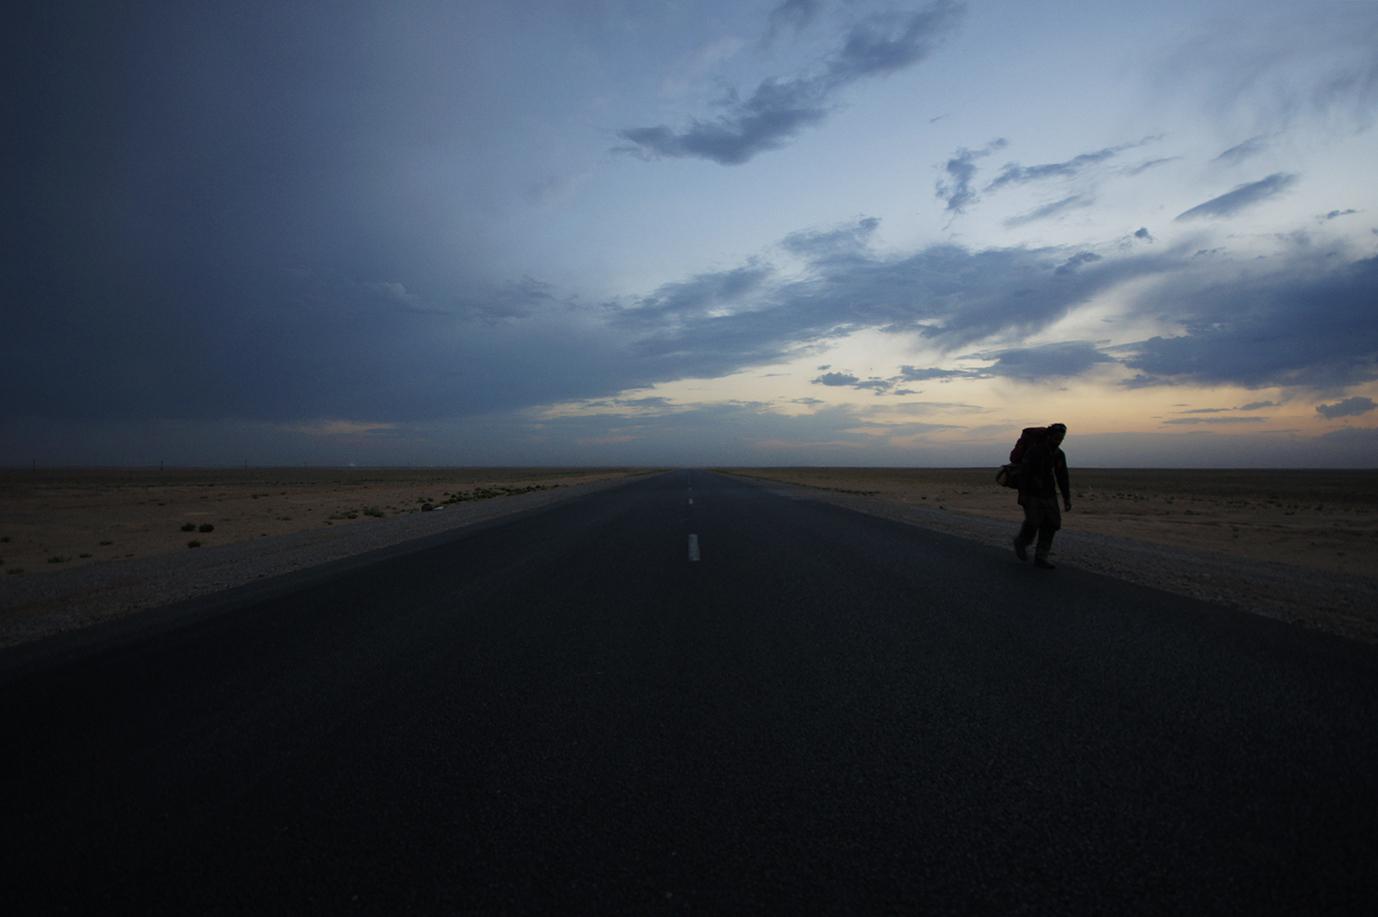 Arjun on the Steppe